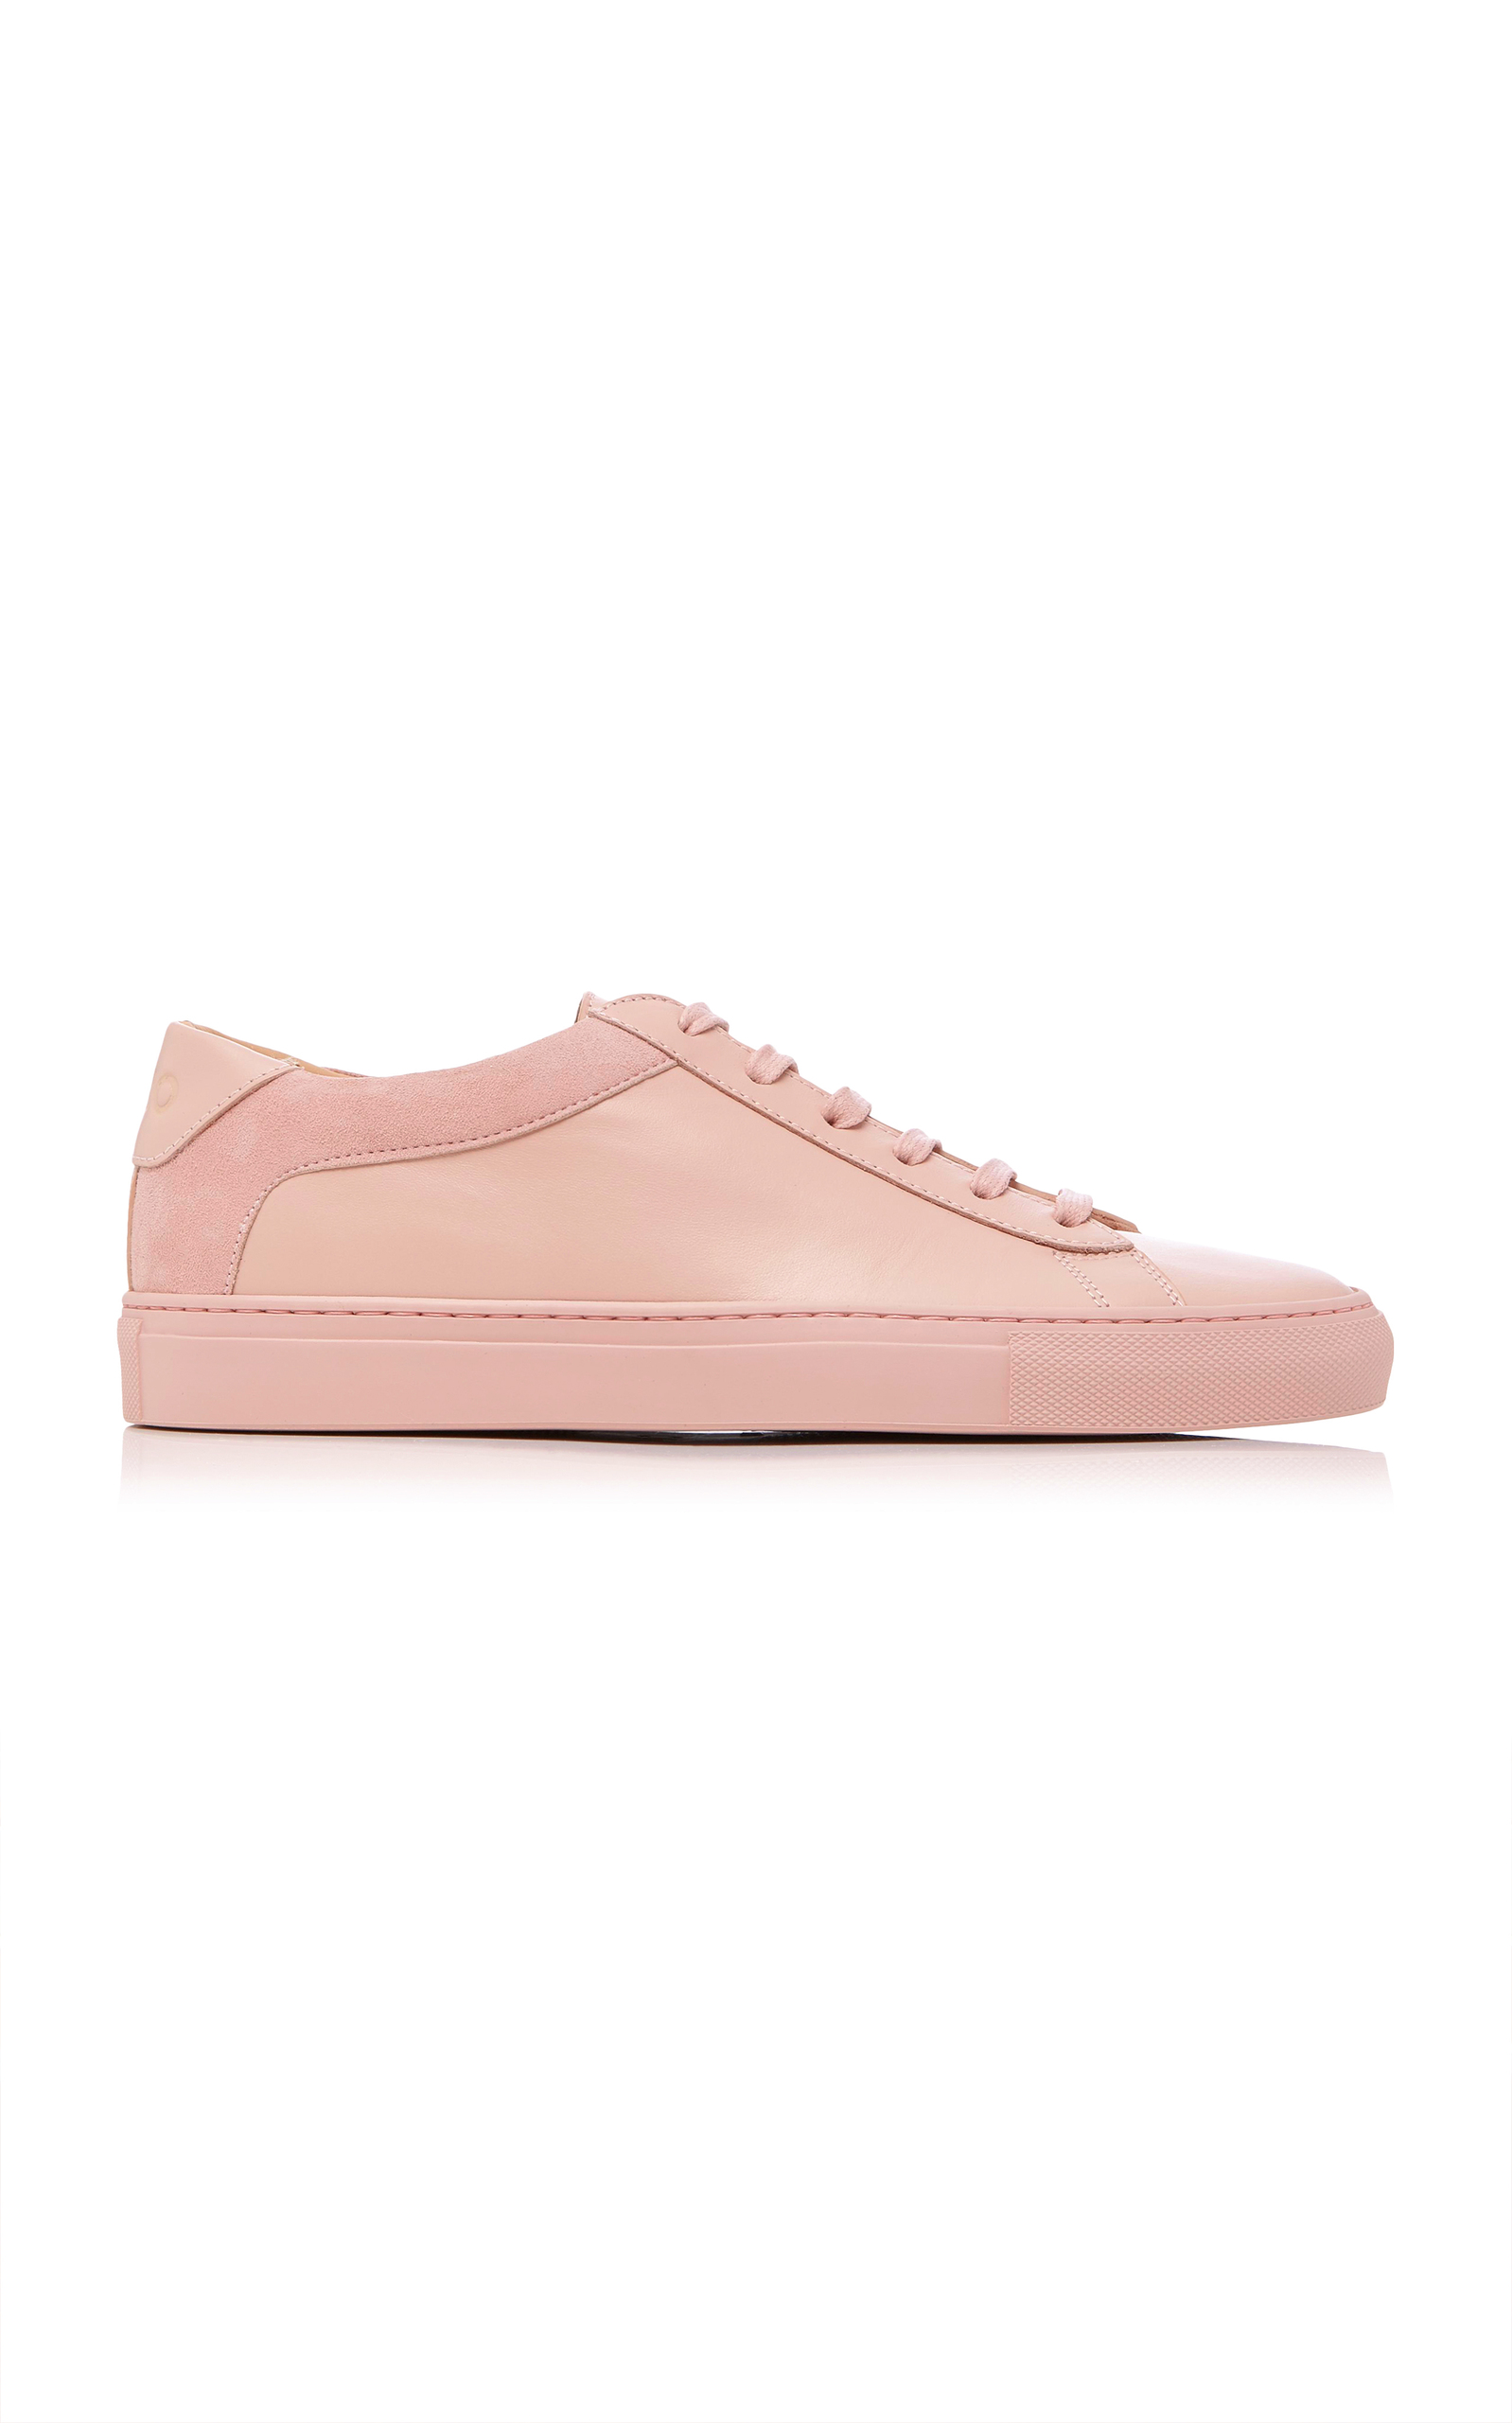 Capri Fiore sneakers - Pink & Purple KOIO vWULeN6Vwy